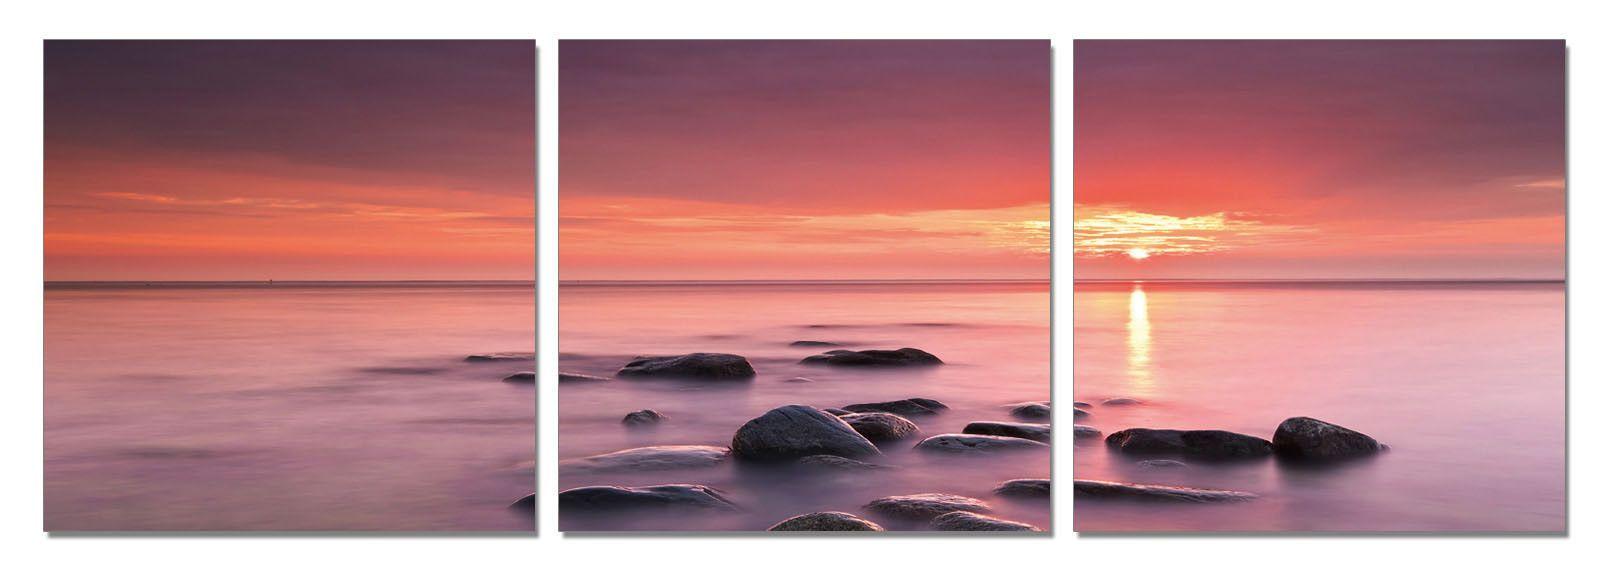 Pink Sunset On Rocks Pink Sunset Sunset Landscape